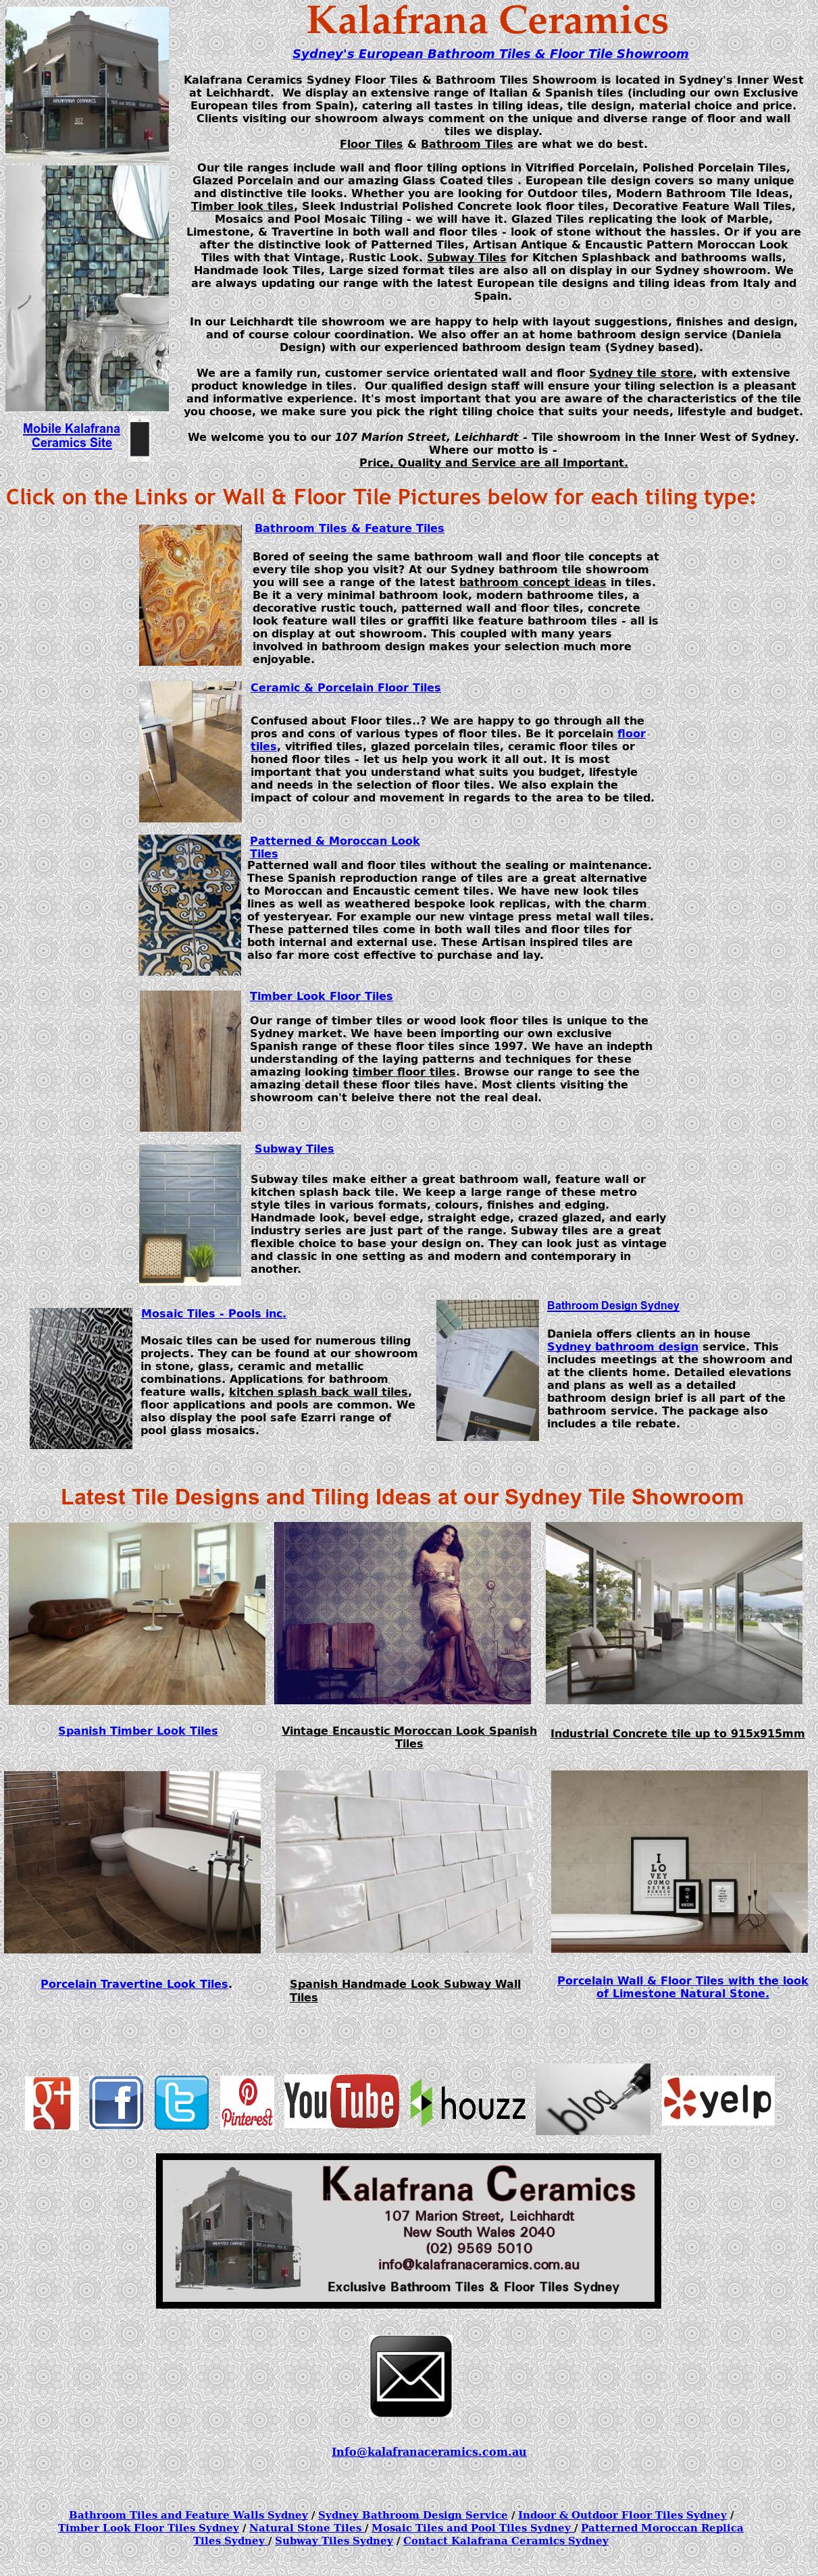 Kalafrana Ceramics Tiles Sydney Competitors, Revenue and Employees ...